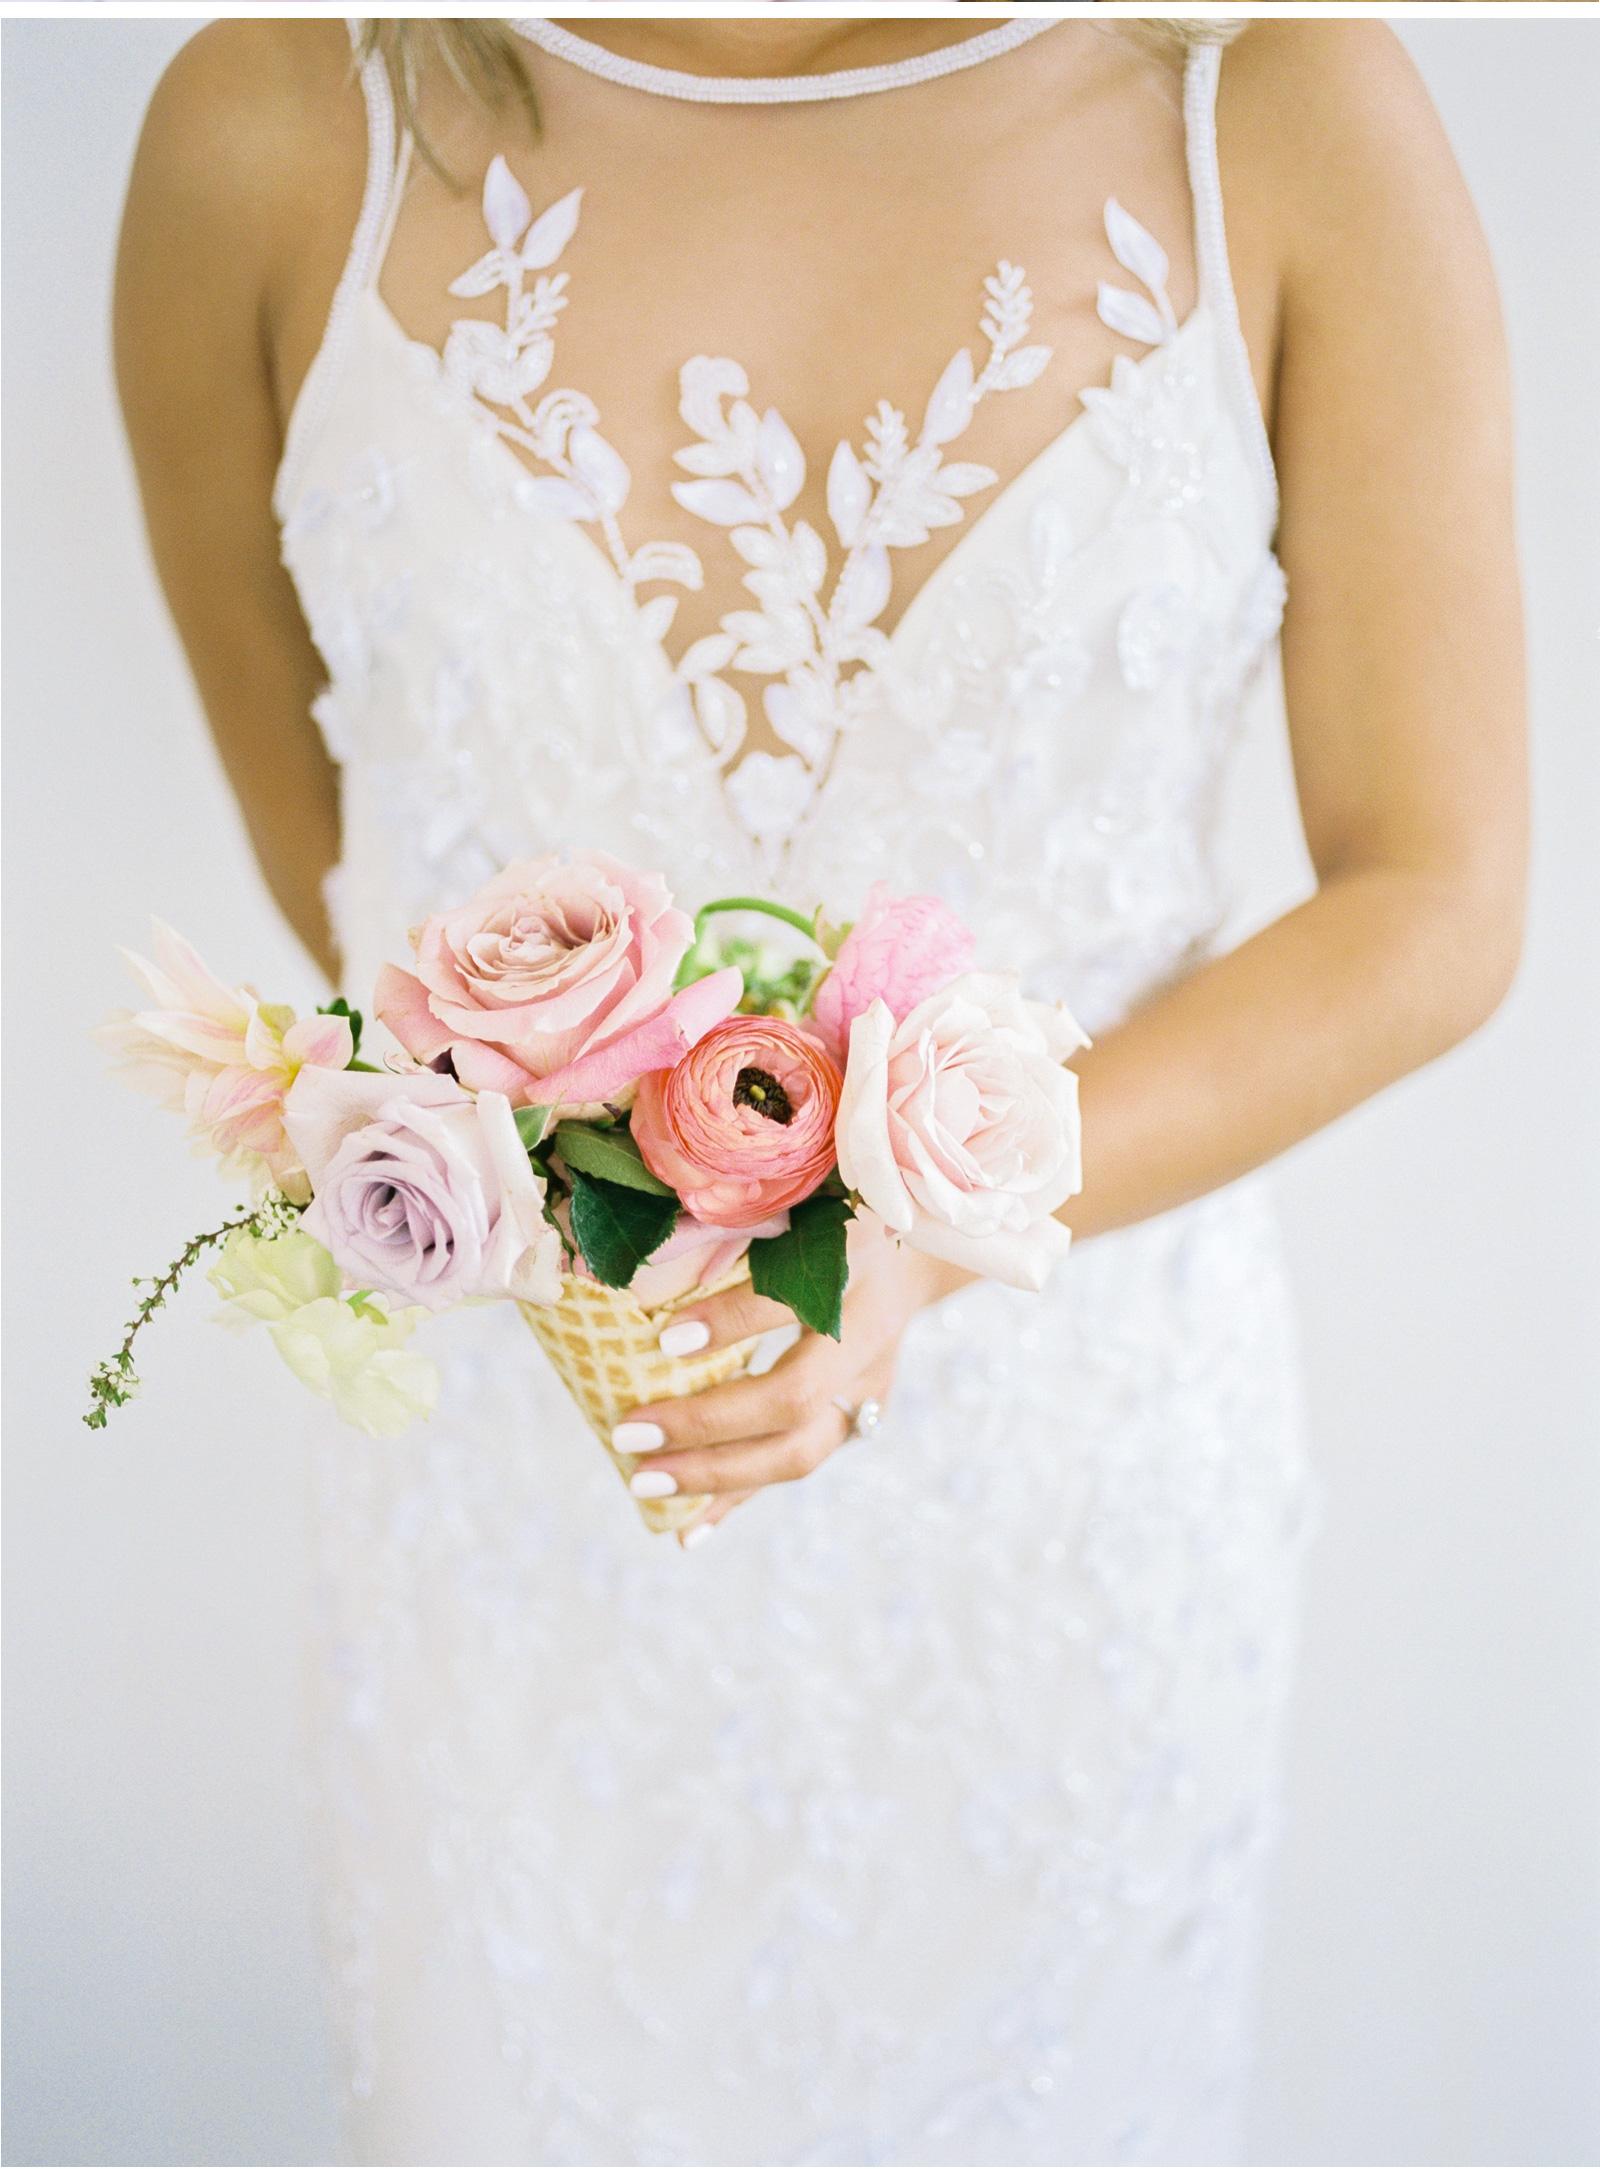 Malibu-Wedding-Photographer-Natalie-Schutt-Photography-Inspired-by-This_11.jpg